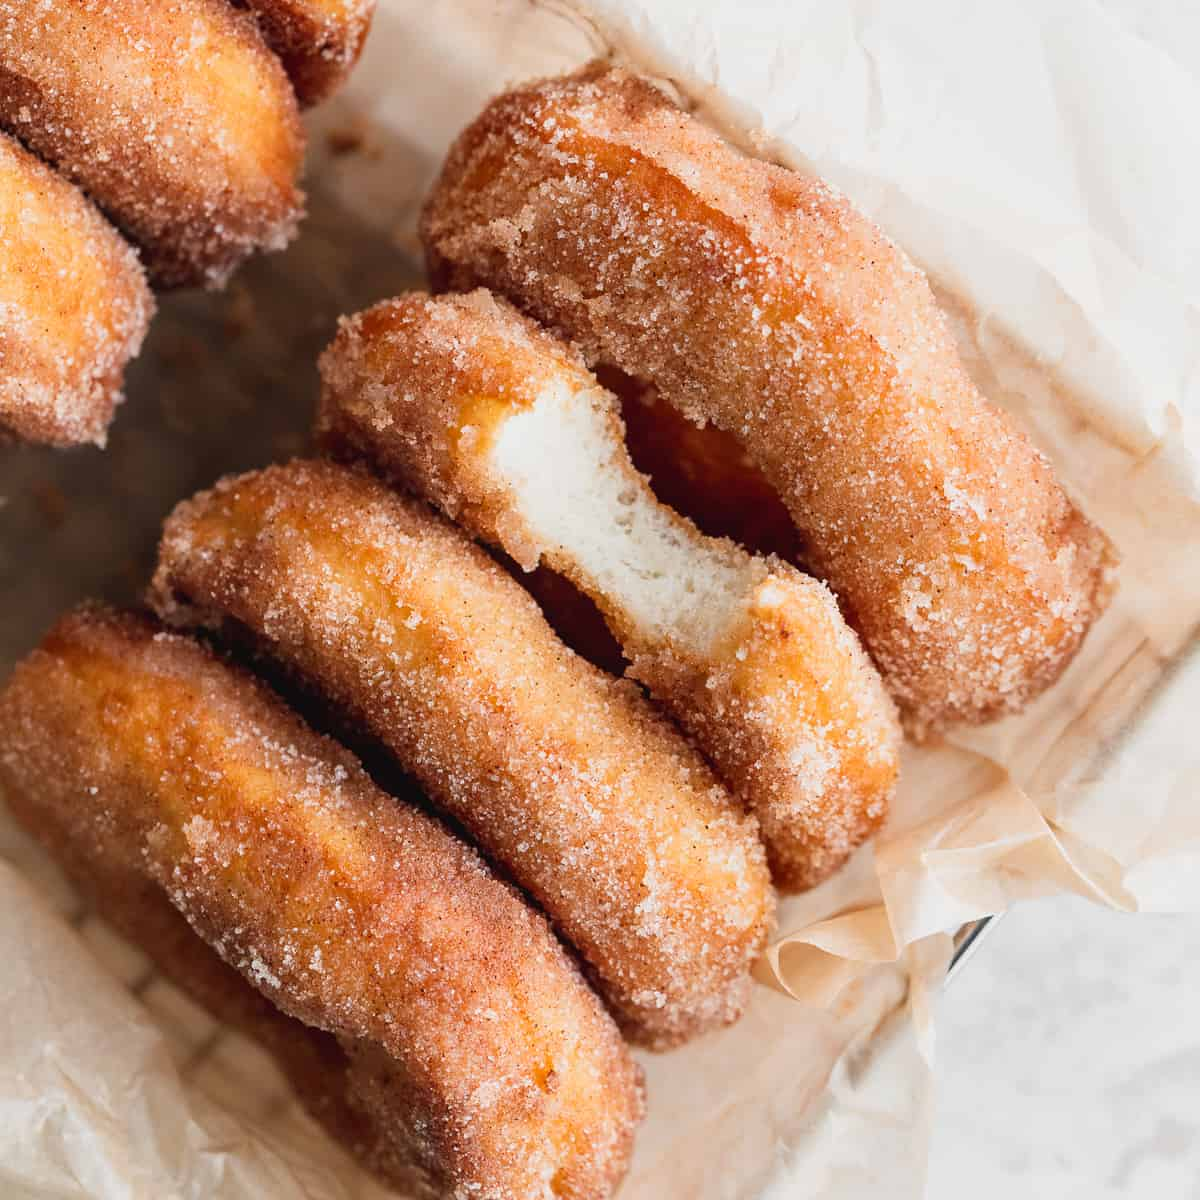 Close up of cinnamon sugar doughnuts in a basket.